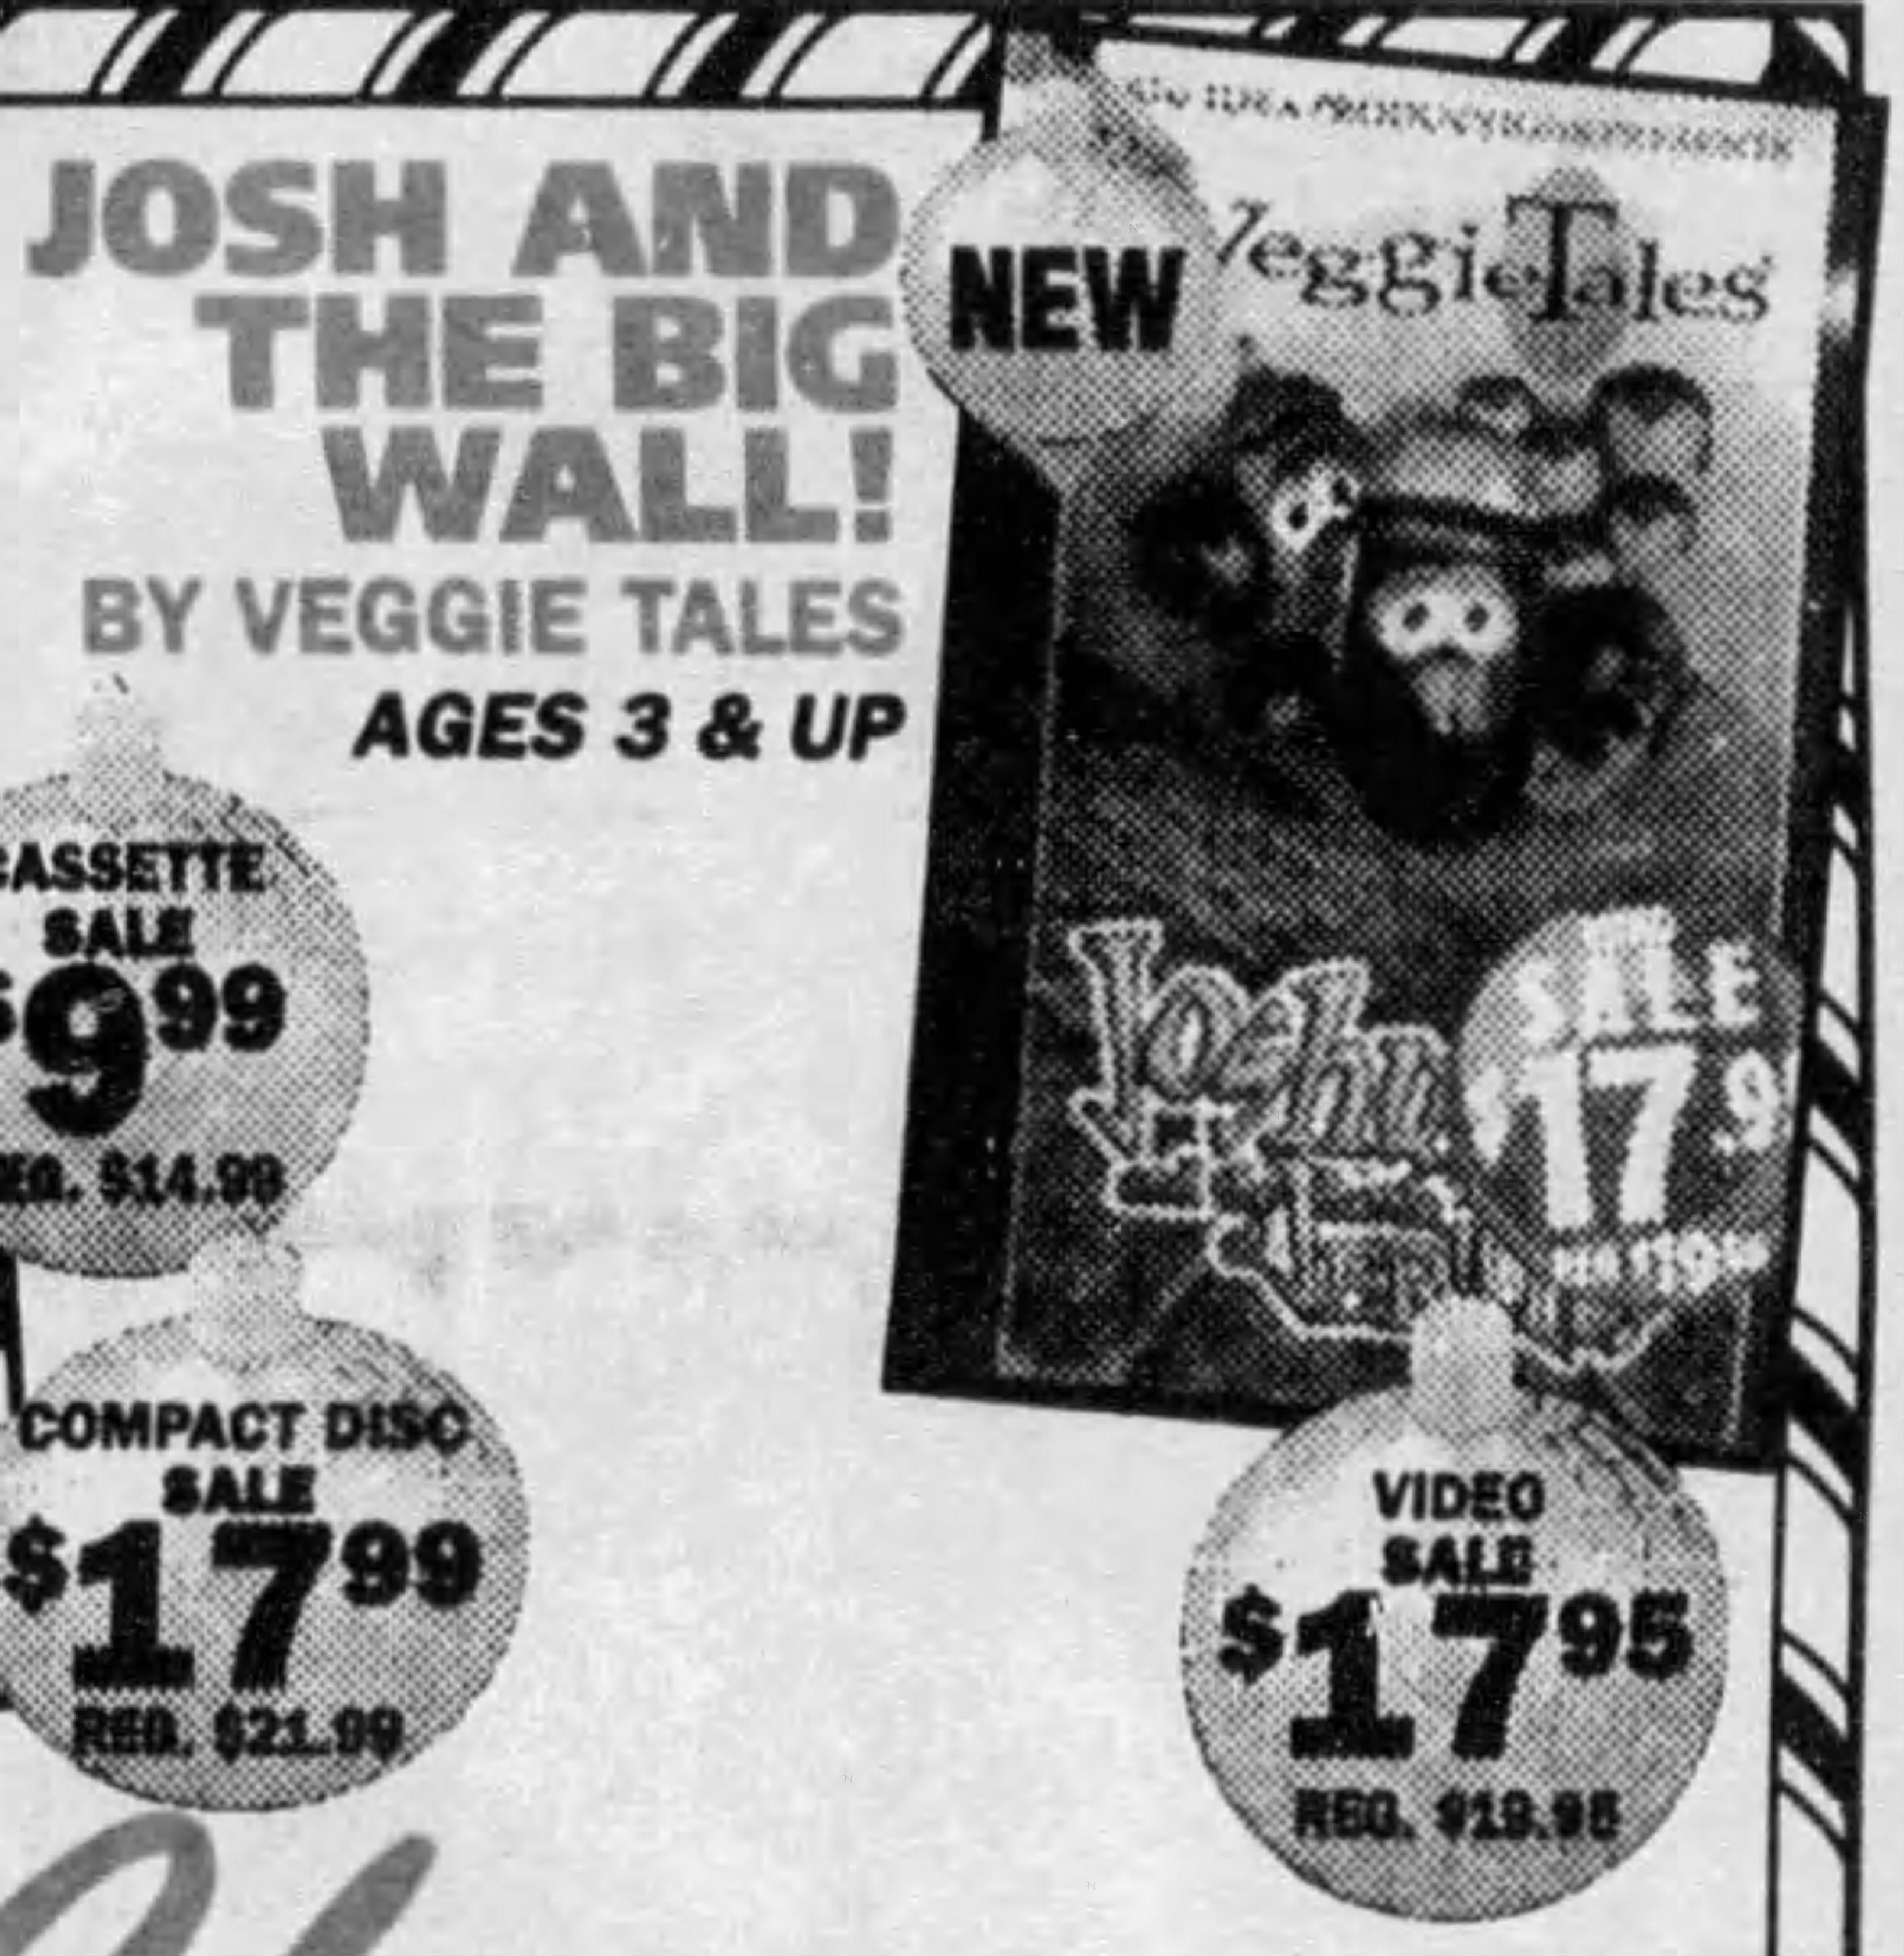 Josh and the Big Wall!